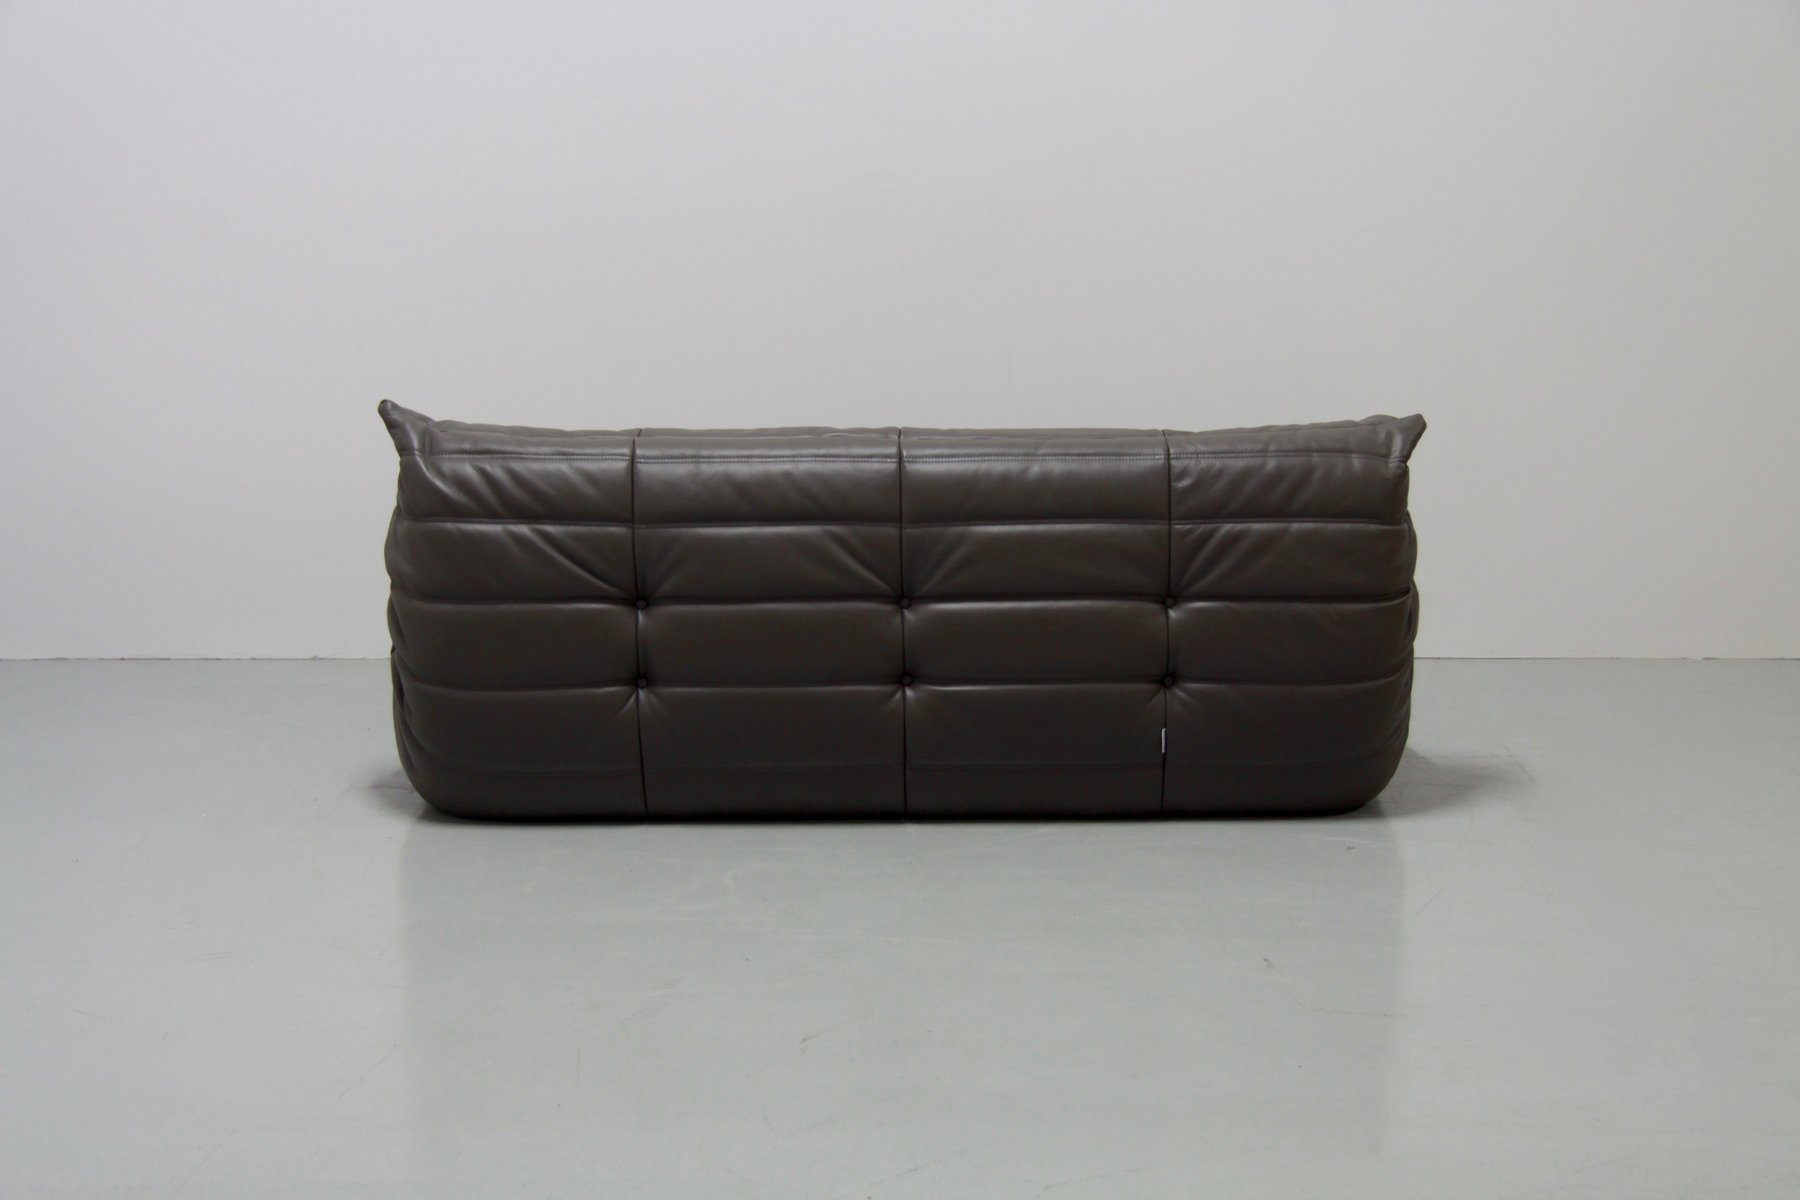 graphit togo ledersofa set von michel ducaroy f r ligne roset 1970er bei pamono kaufen. Black Bedroom Furniture Sets. Home Design Ideas